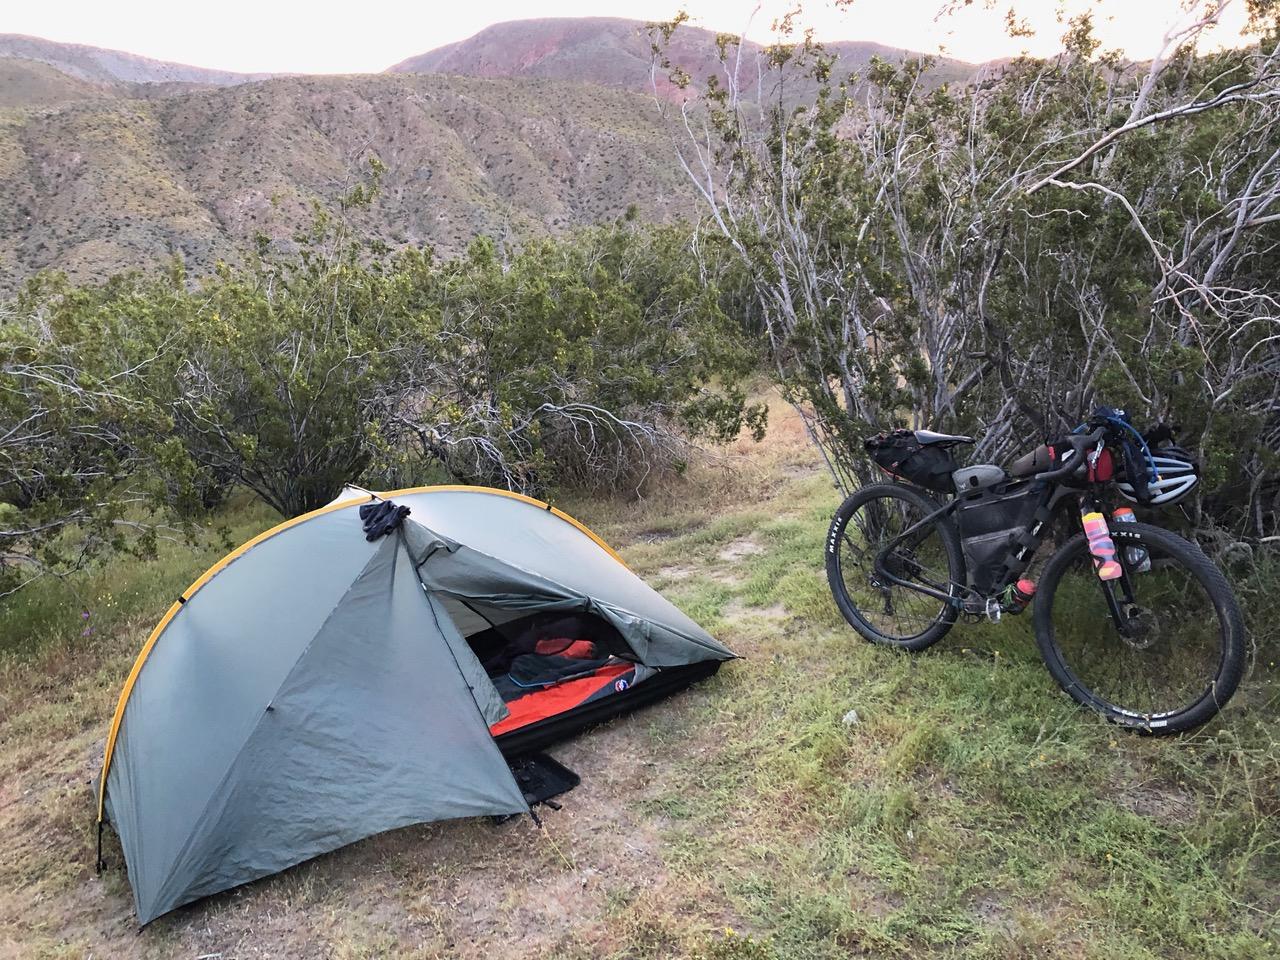 Tarp tent set up at Bailey's Cabin